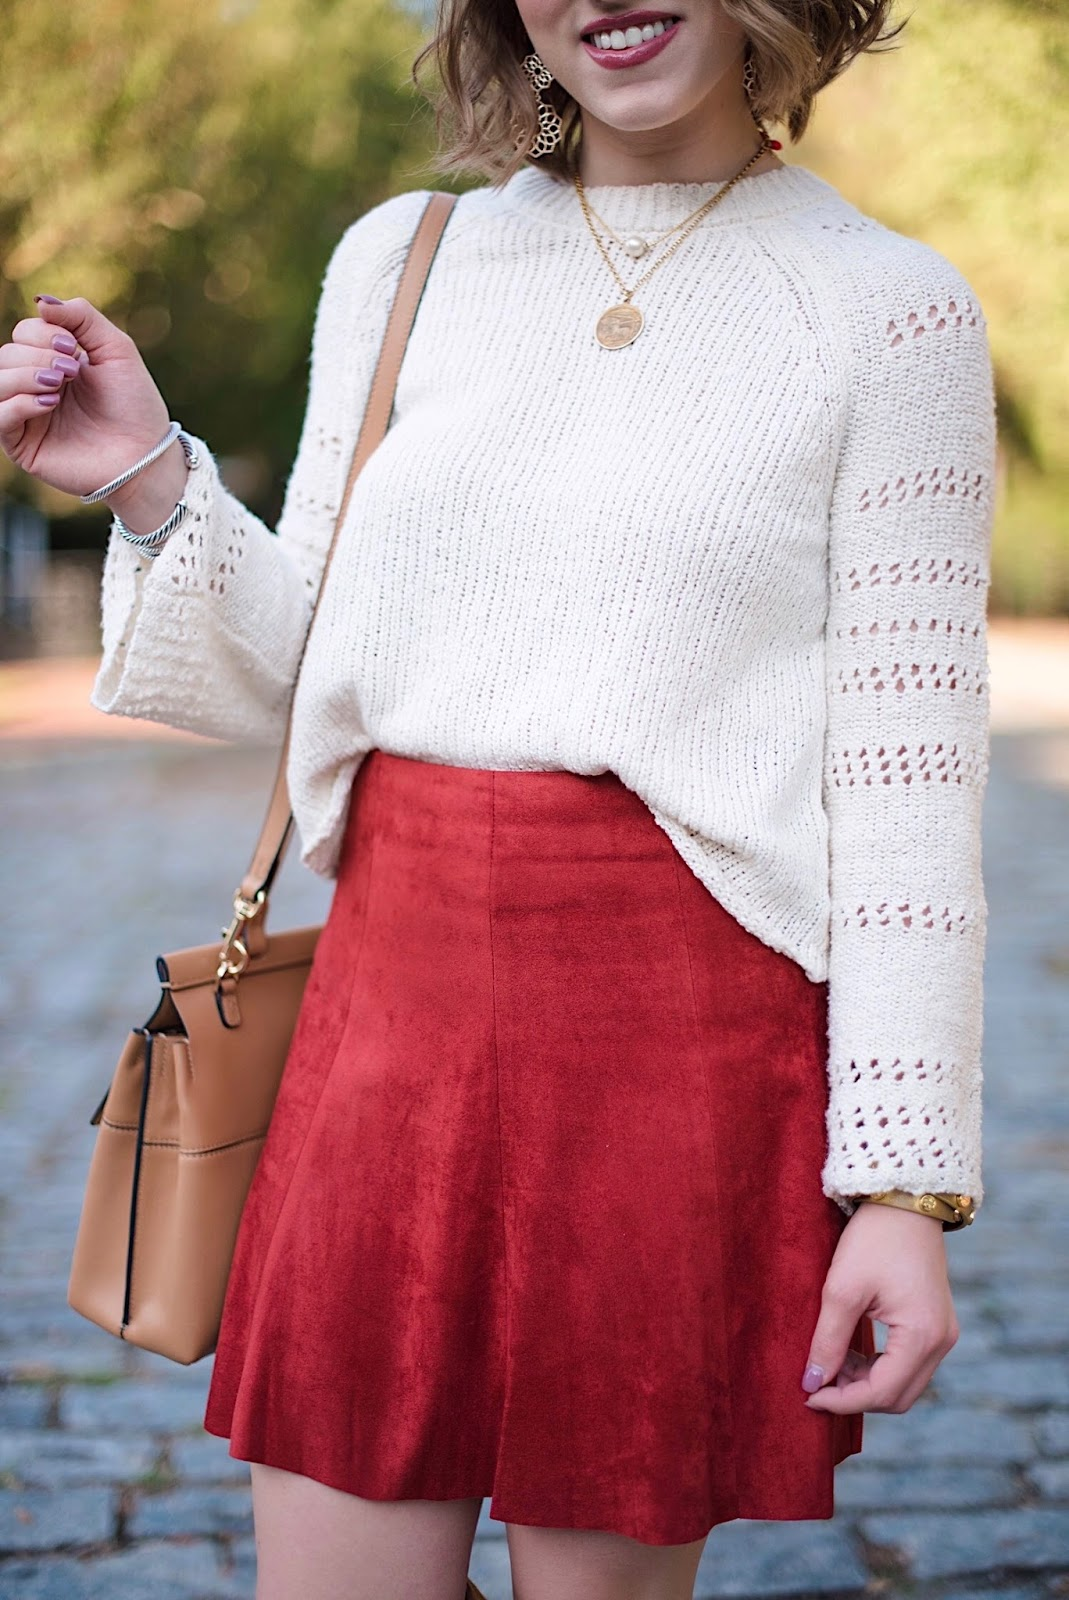 Suede Skirt + Bell Sleeve Sweater - Something Delightful Blog